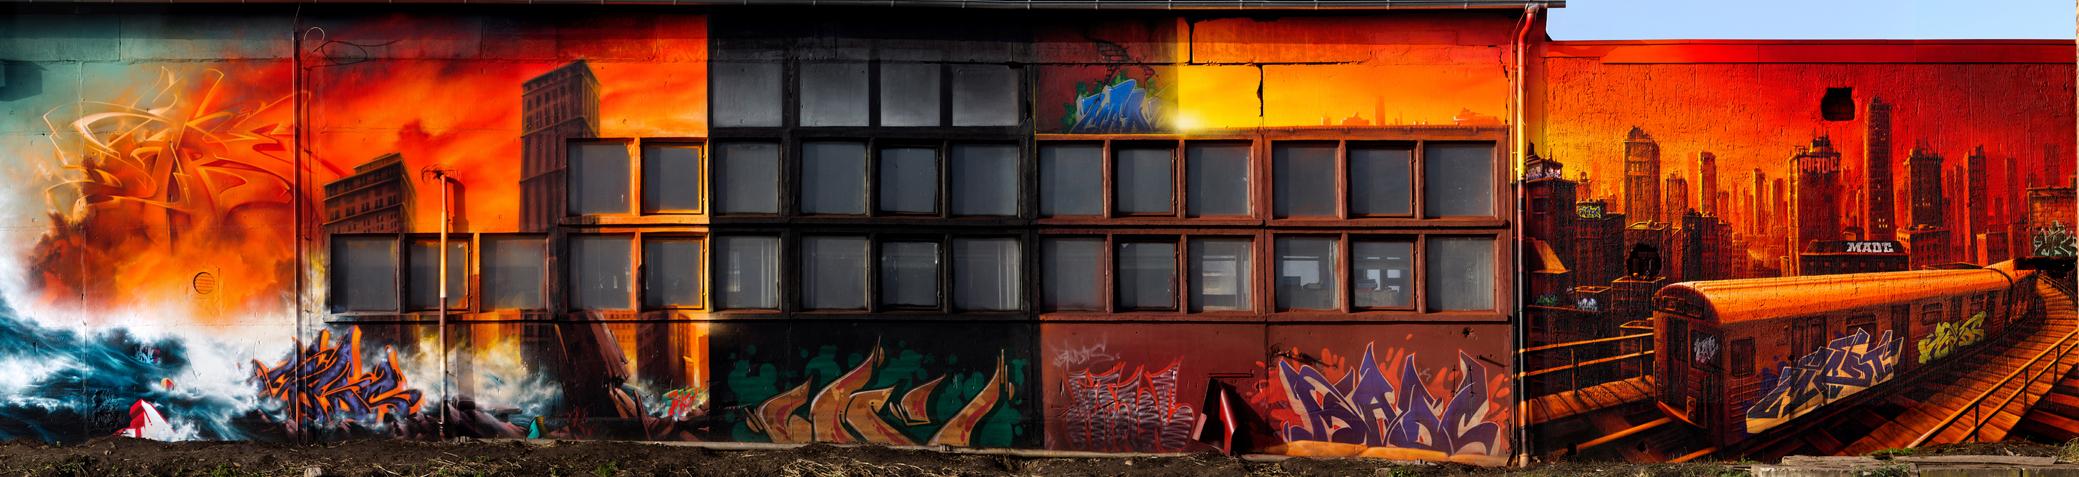 claudia walde madc graffiti 700 wall (4)